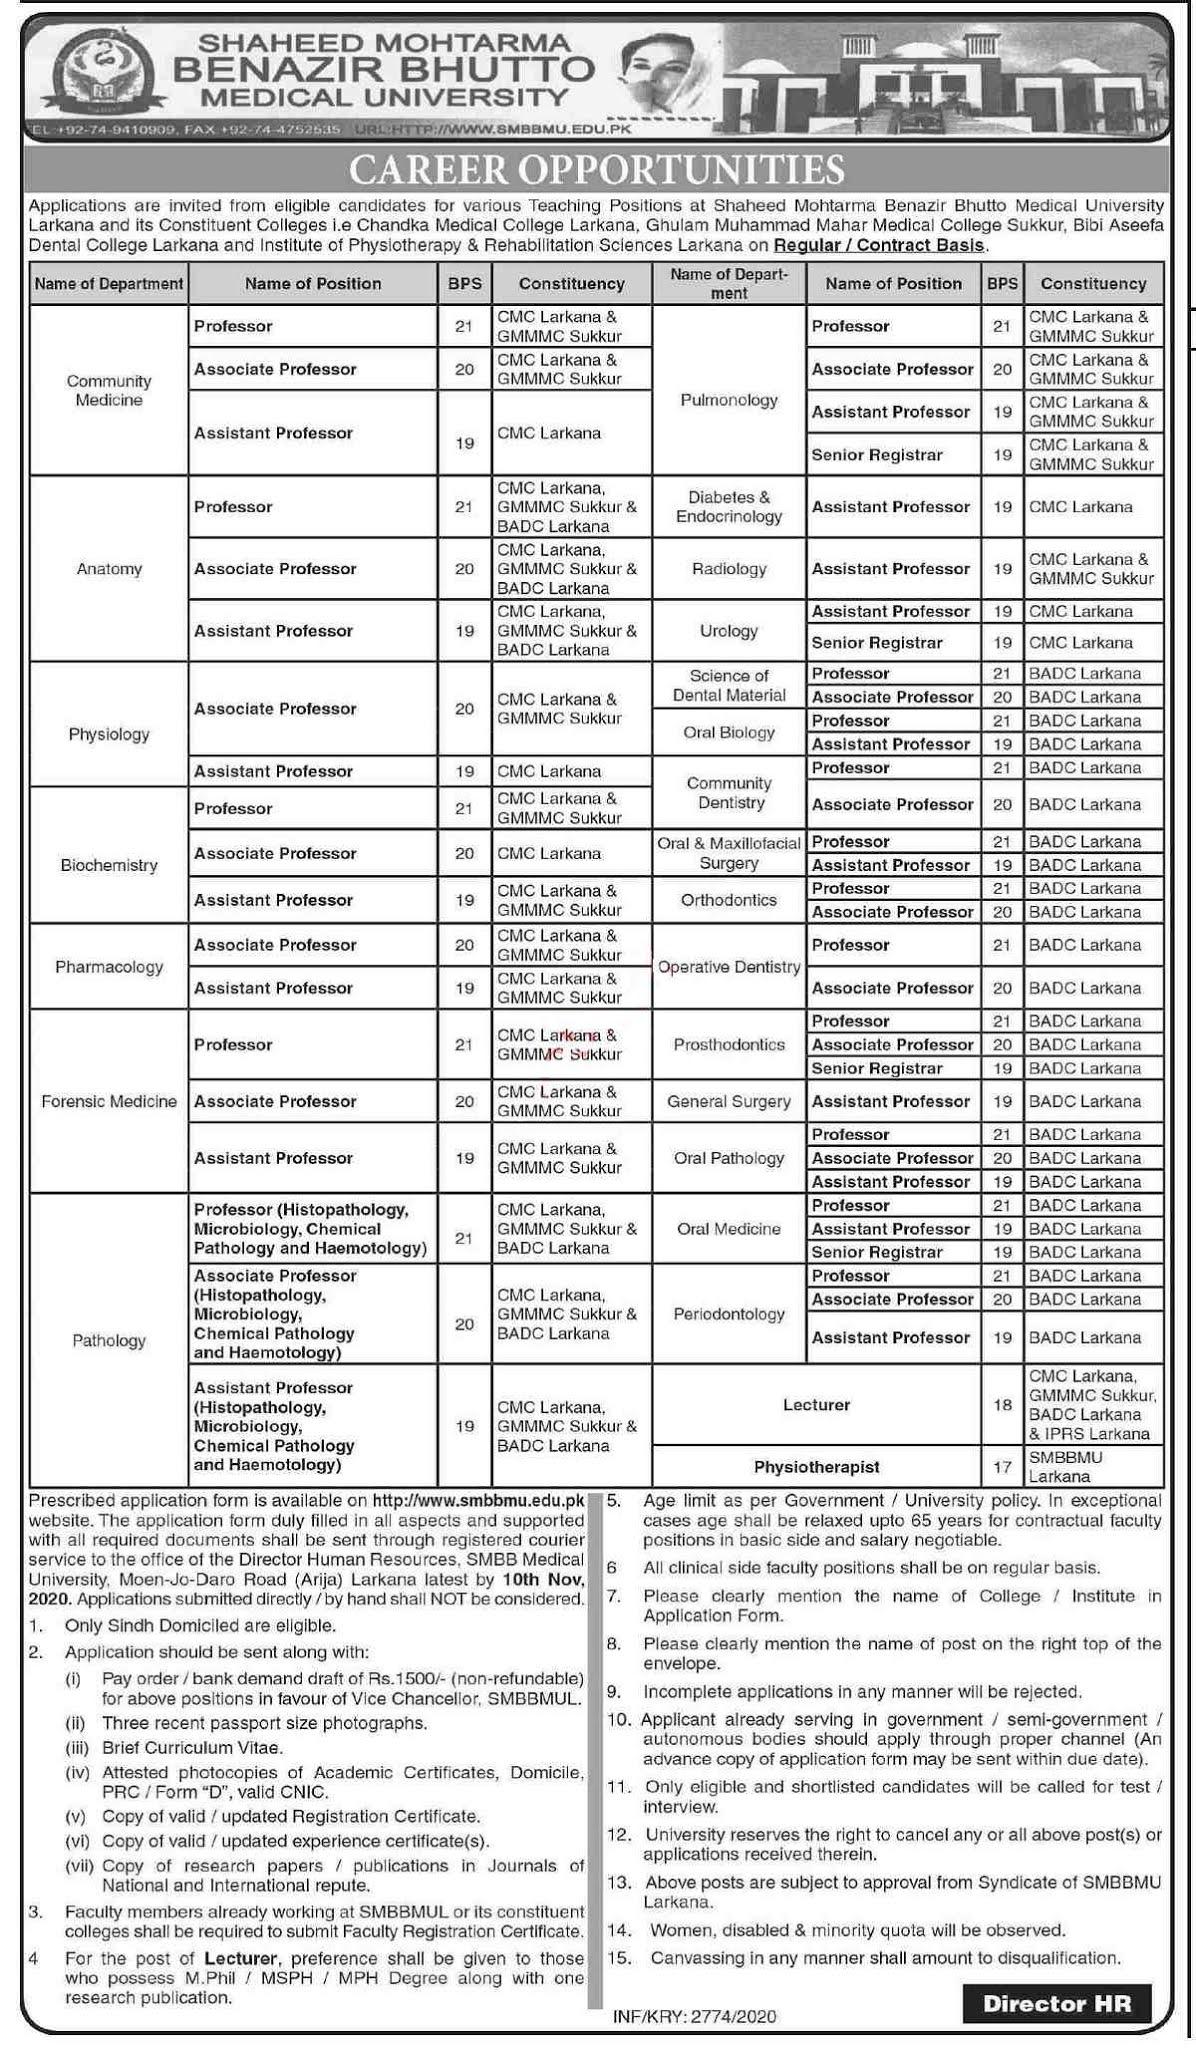 Latest Shaheed Mohtarma Benazir Bhutto Medical University Medical Posts Larkana 2020